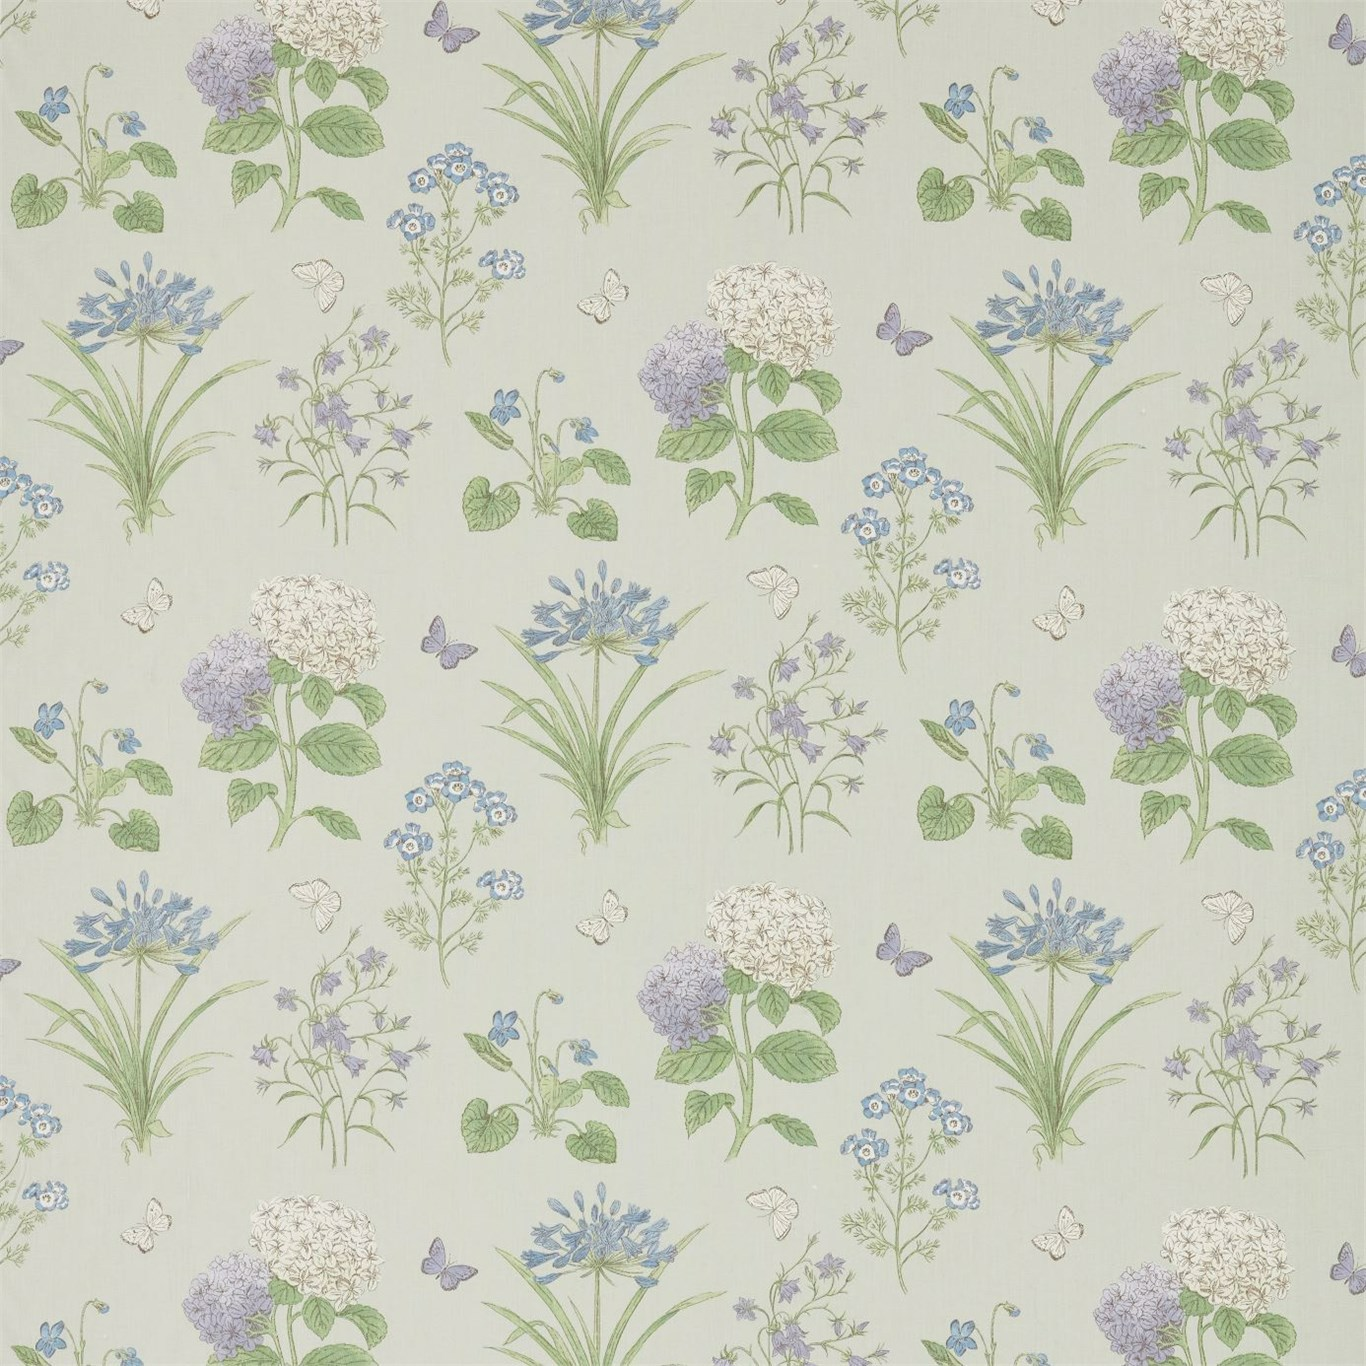 Harebells & Violets by SAN